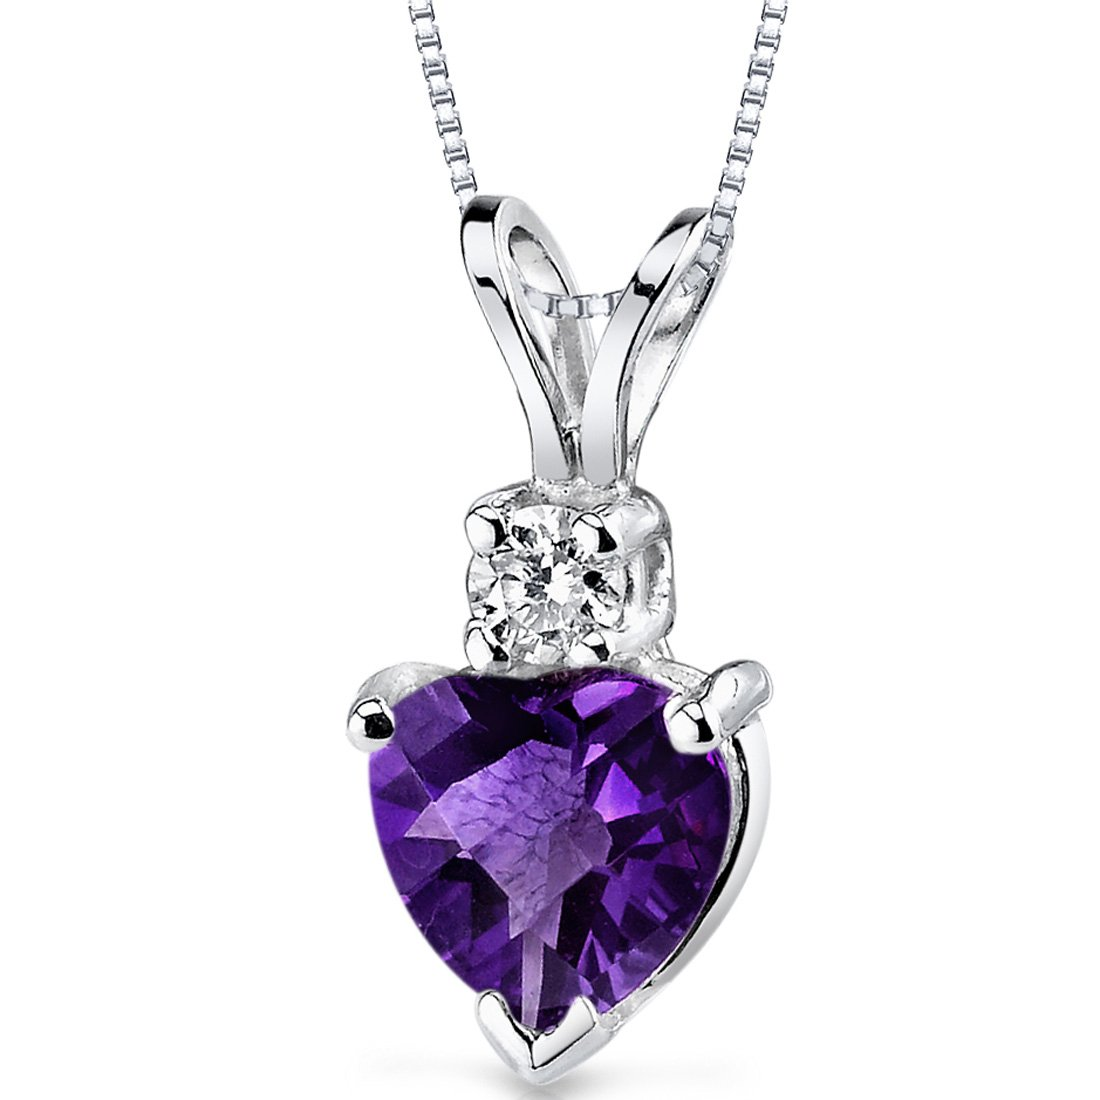 14 Karat White Gold Heart Shape 0.75 Carats Amethyst Diamond Pendant